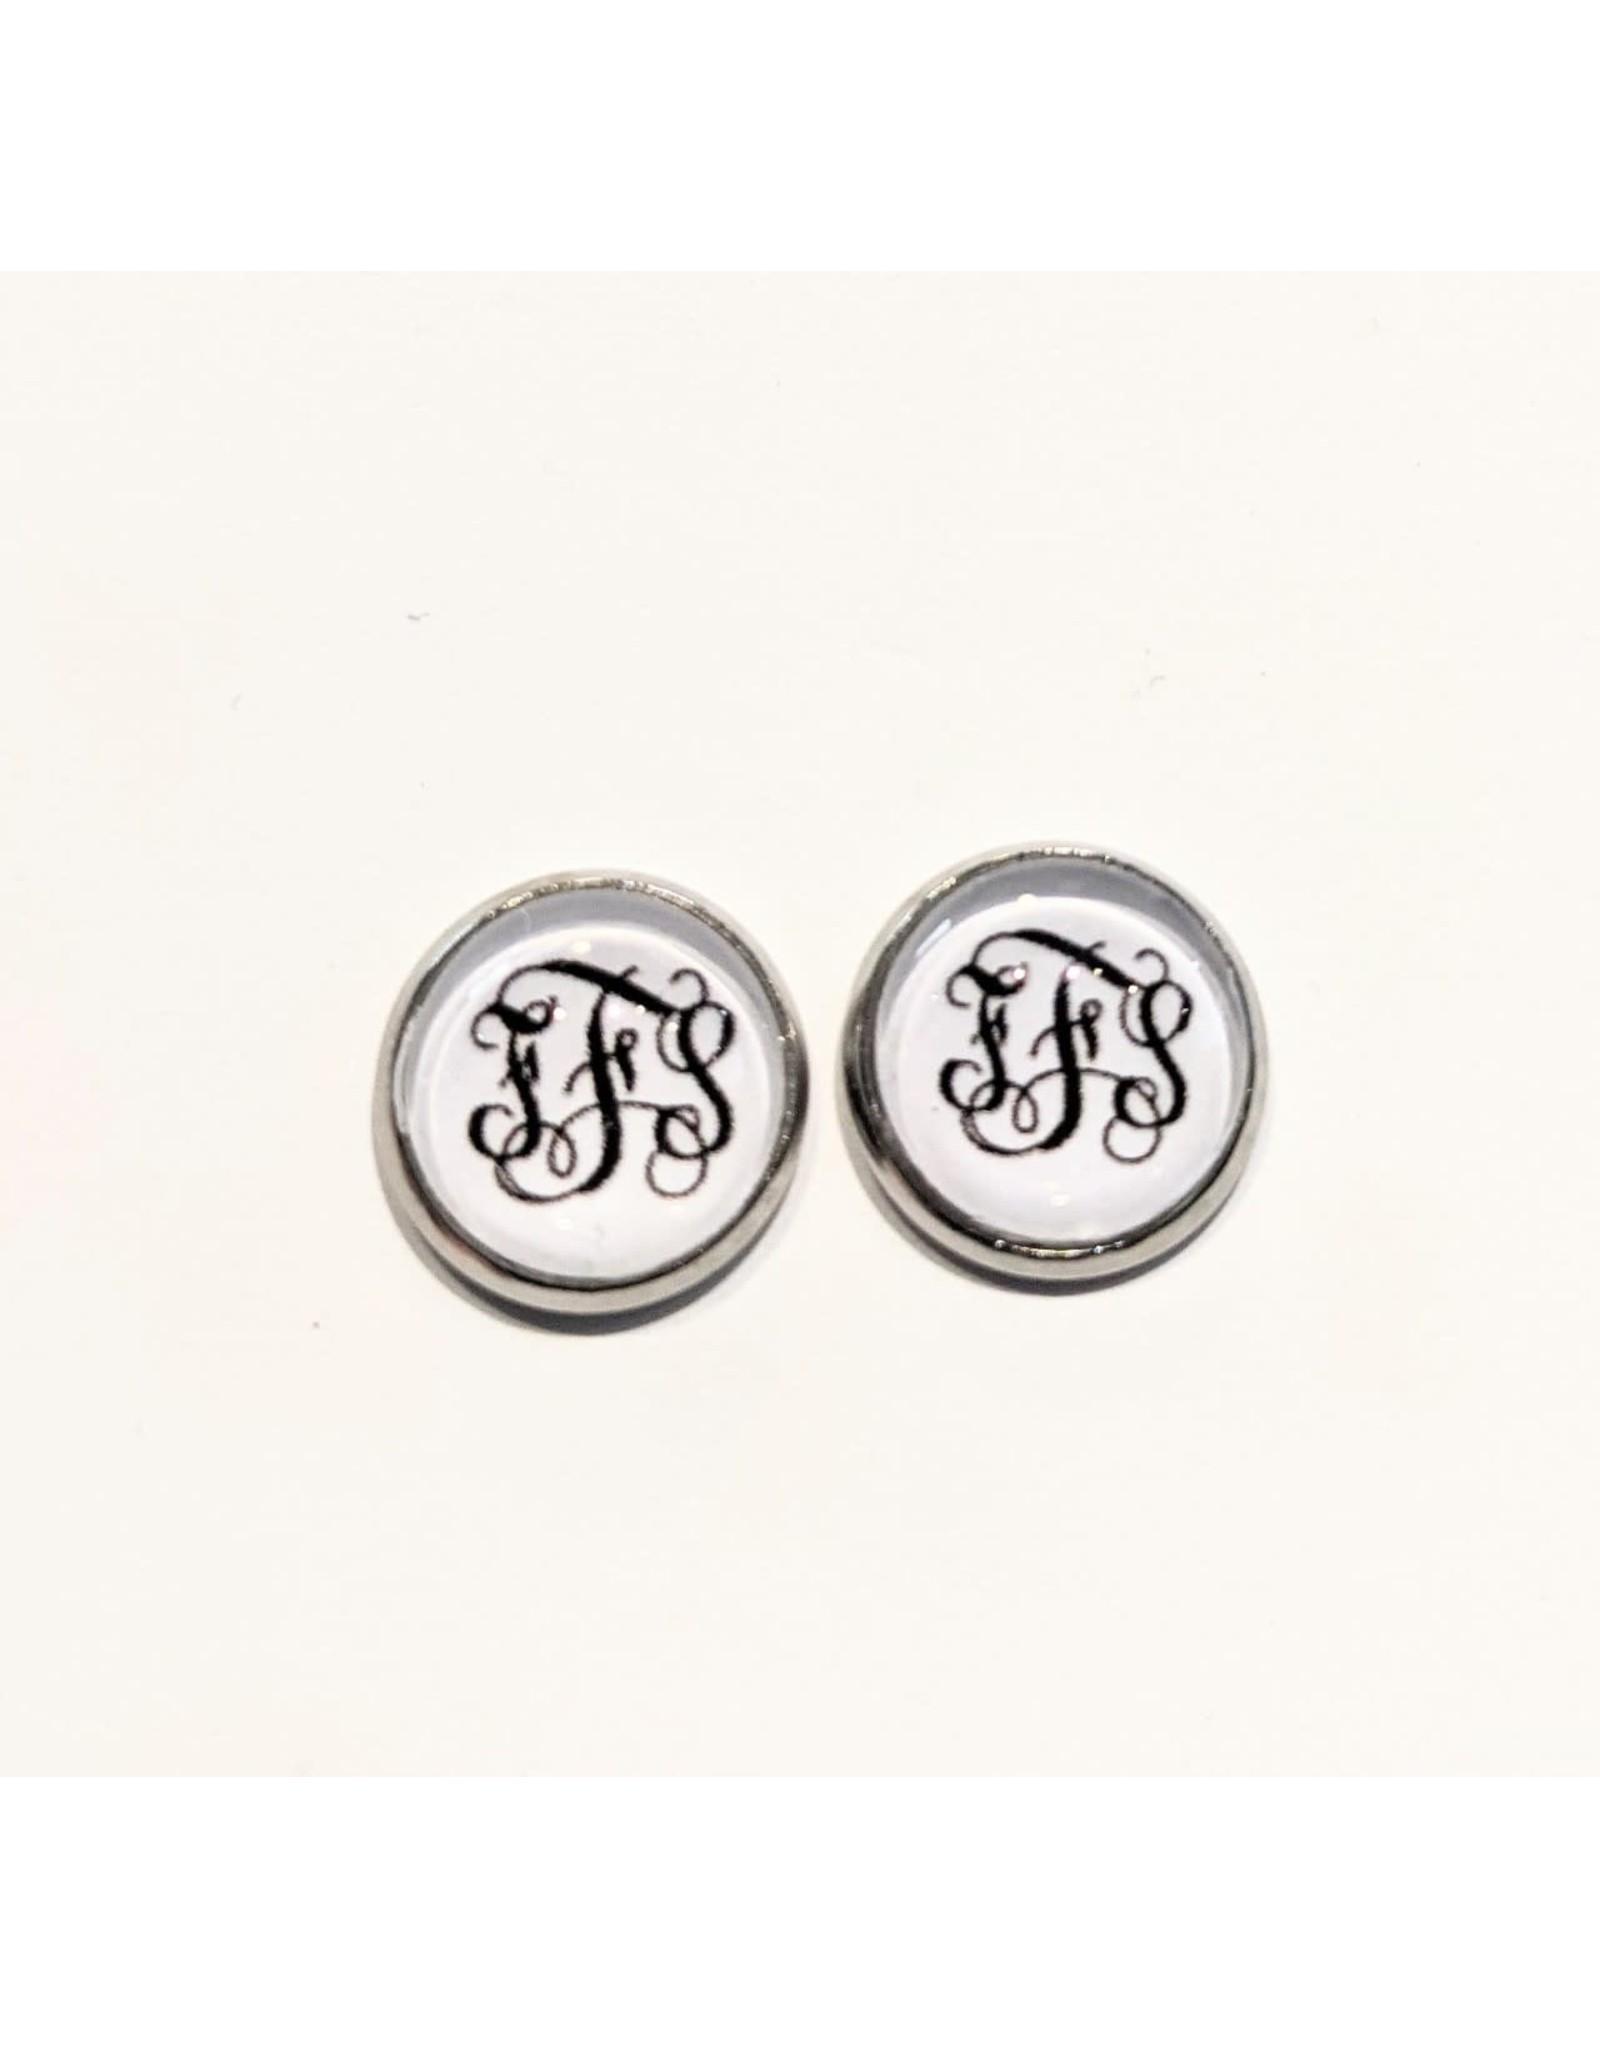 Pish Posh Pendants Earrings - FFS - White With Black Letters